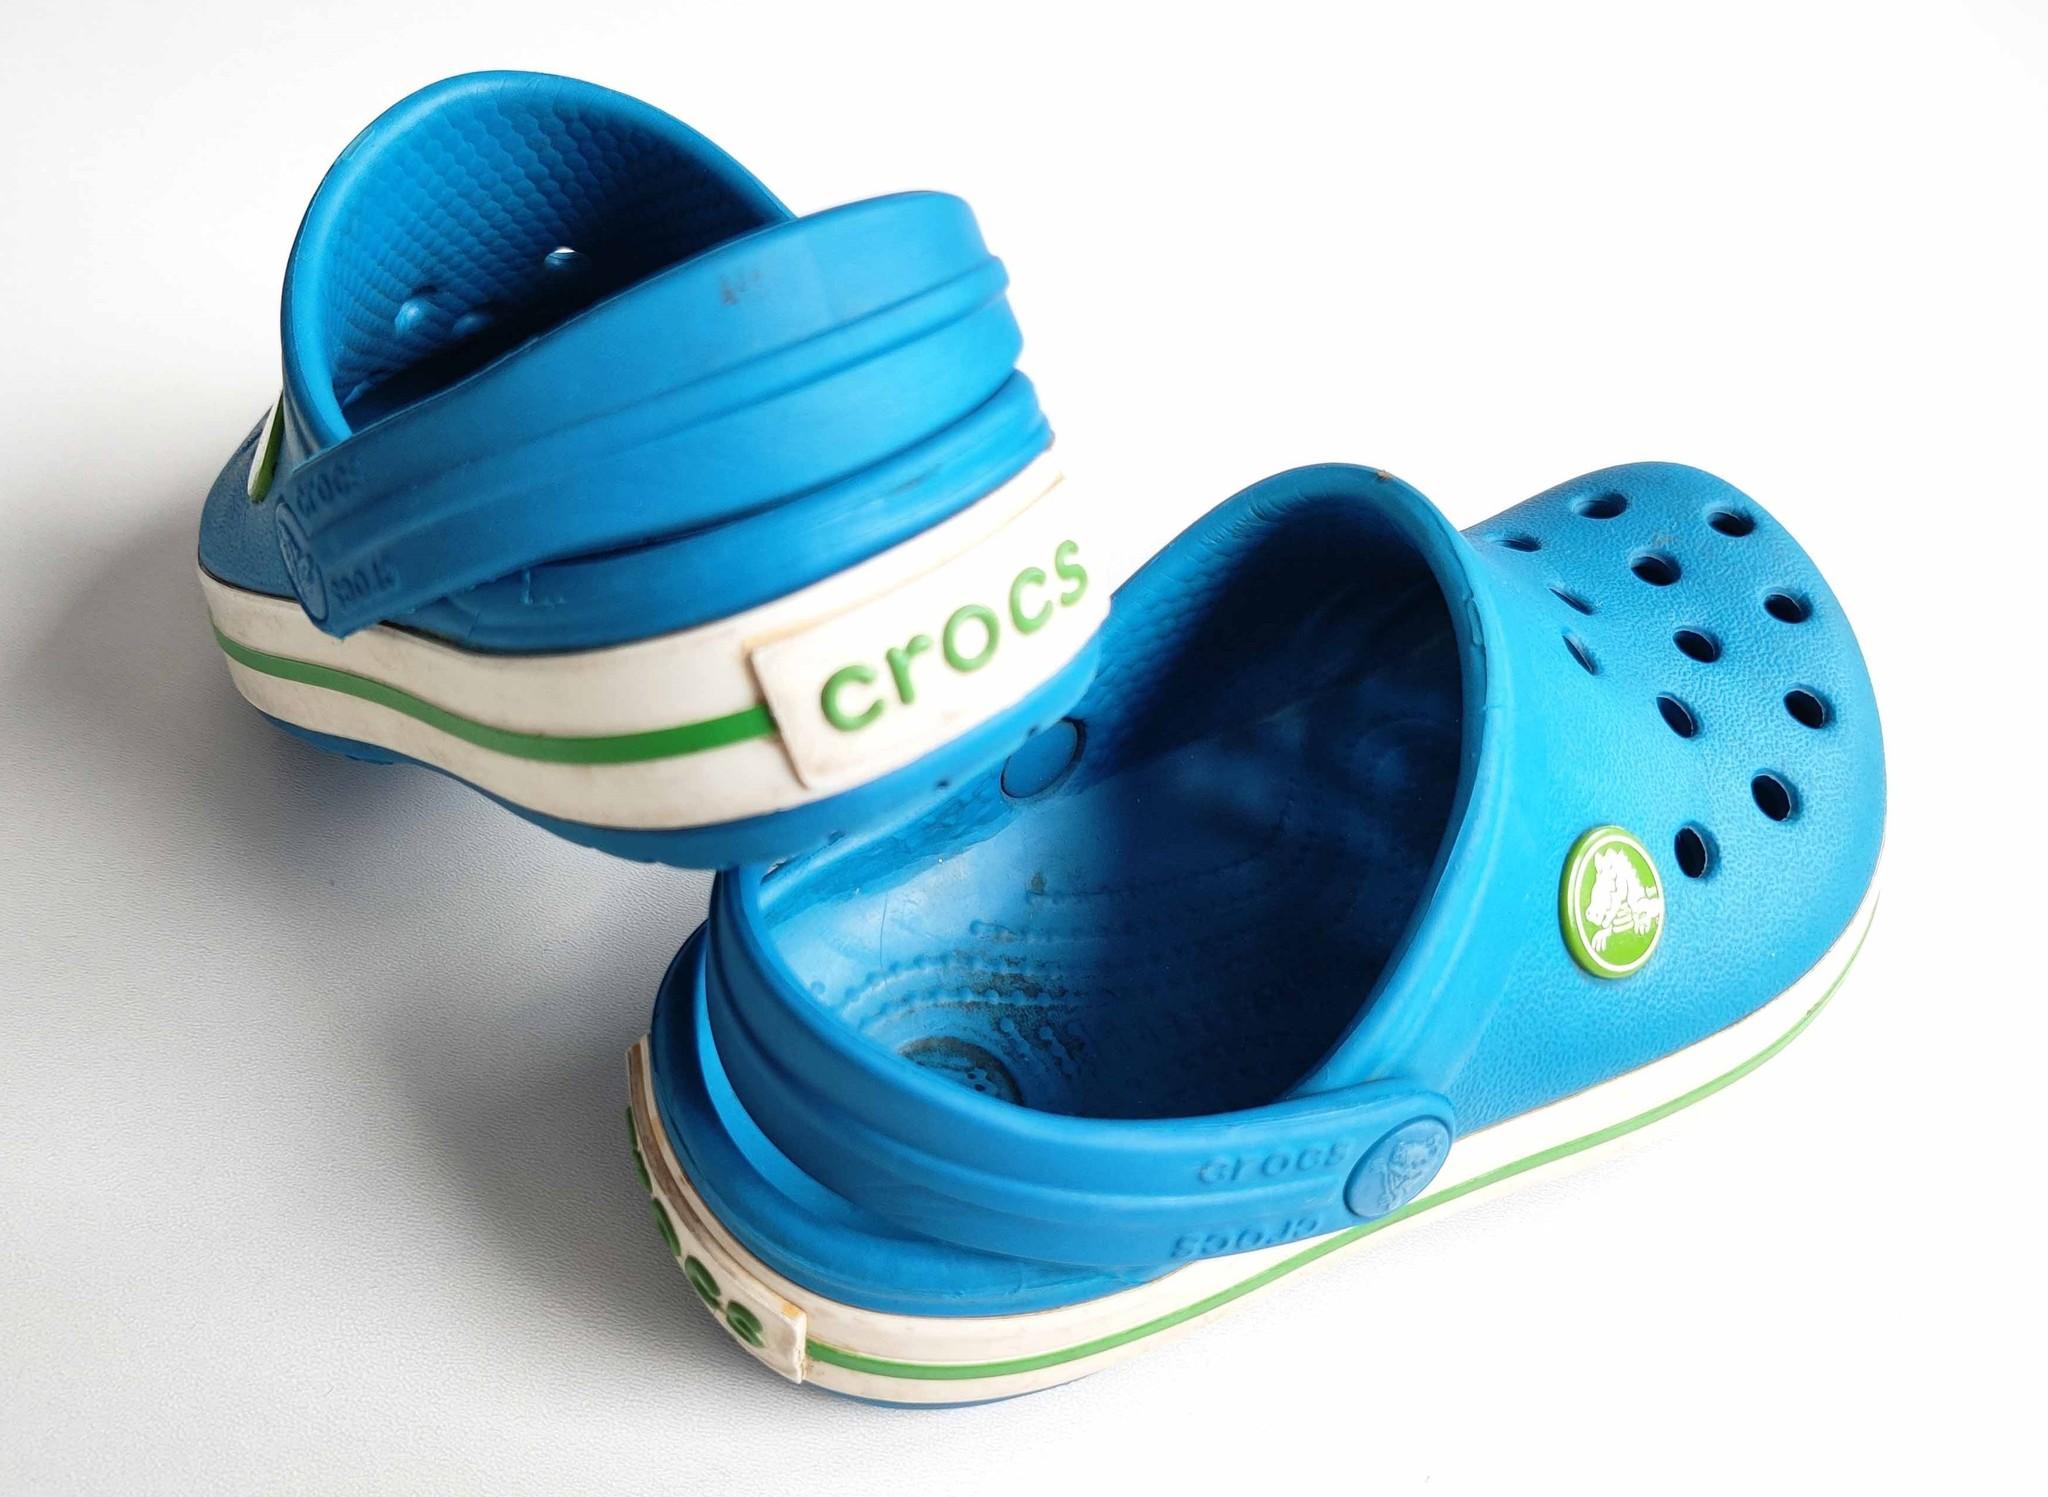 Crocs maat 24-26-2